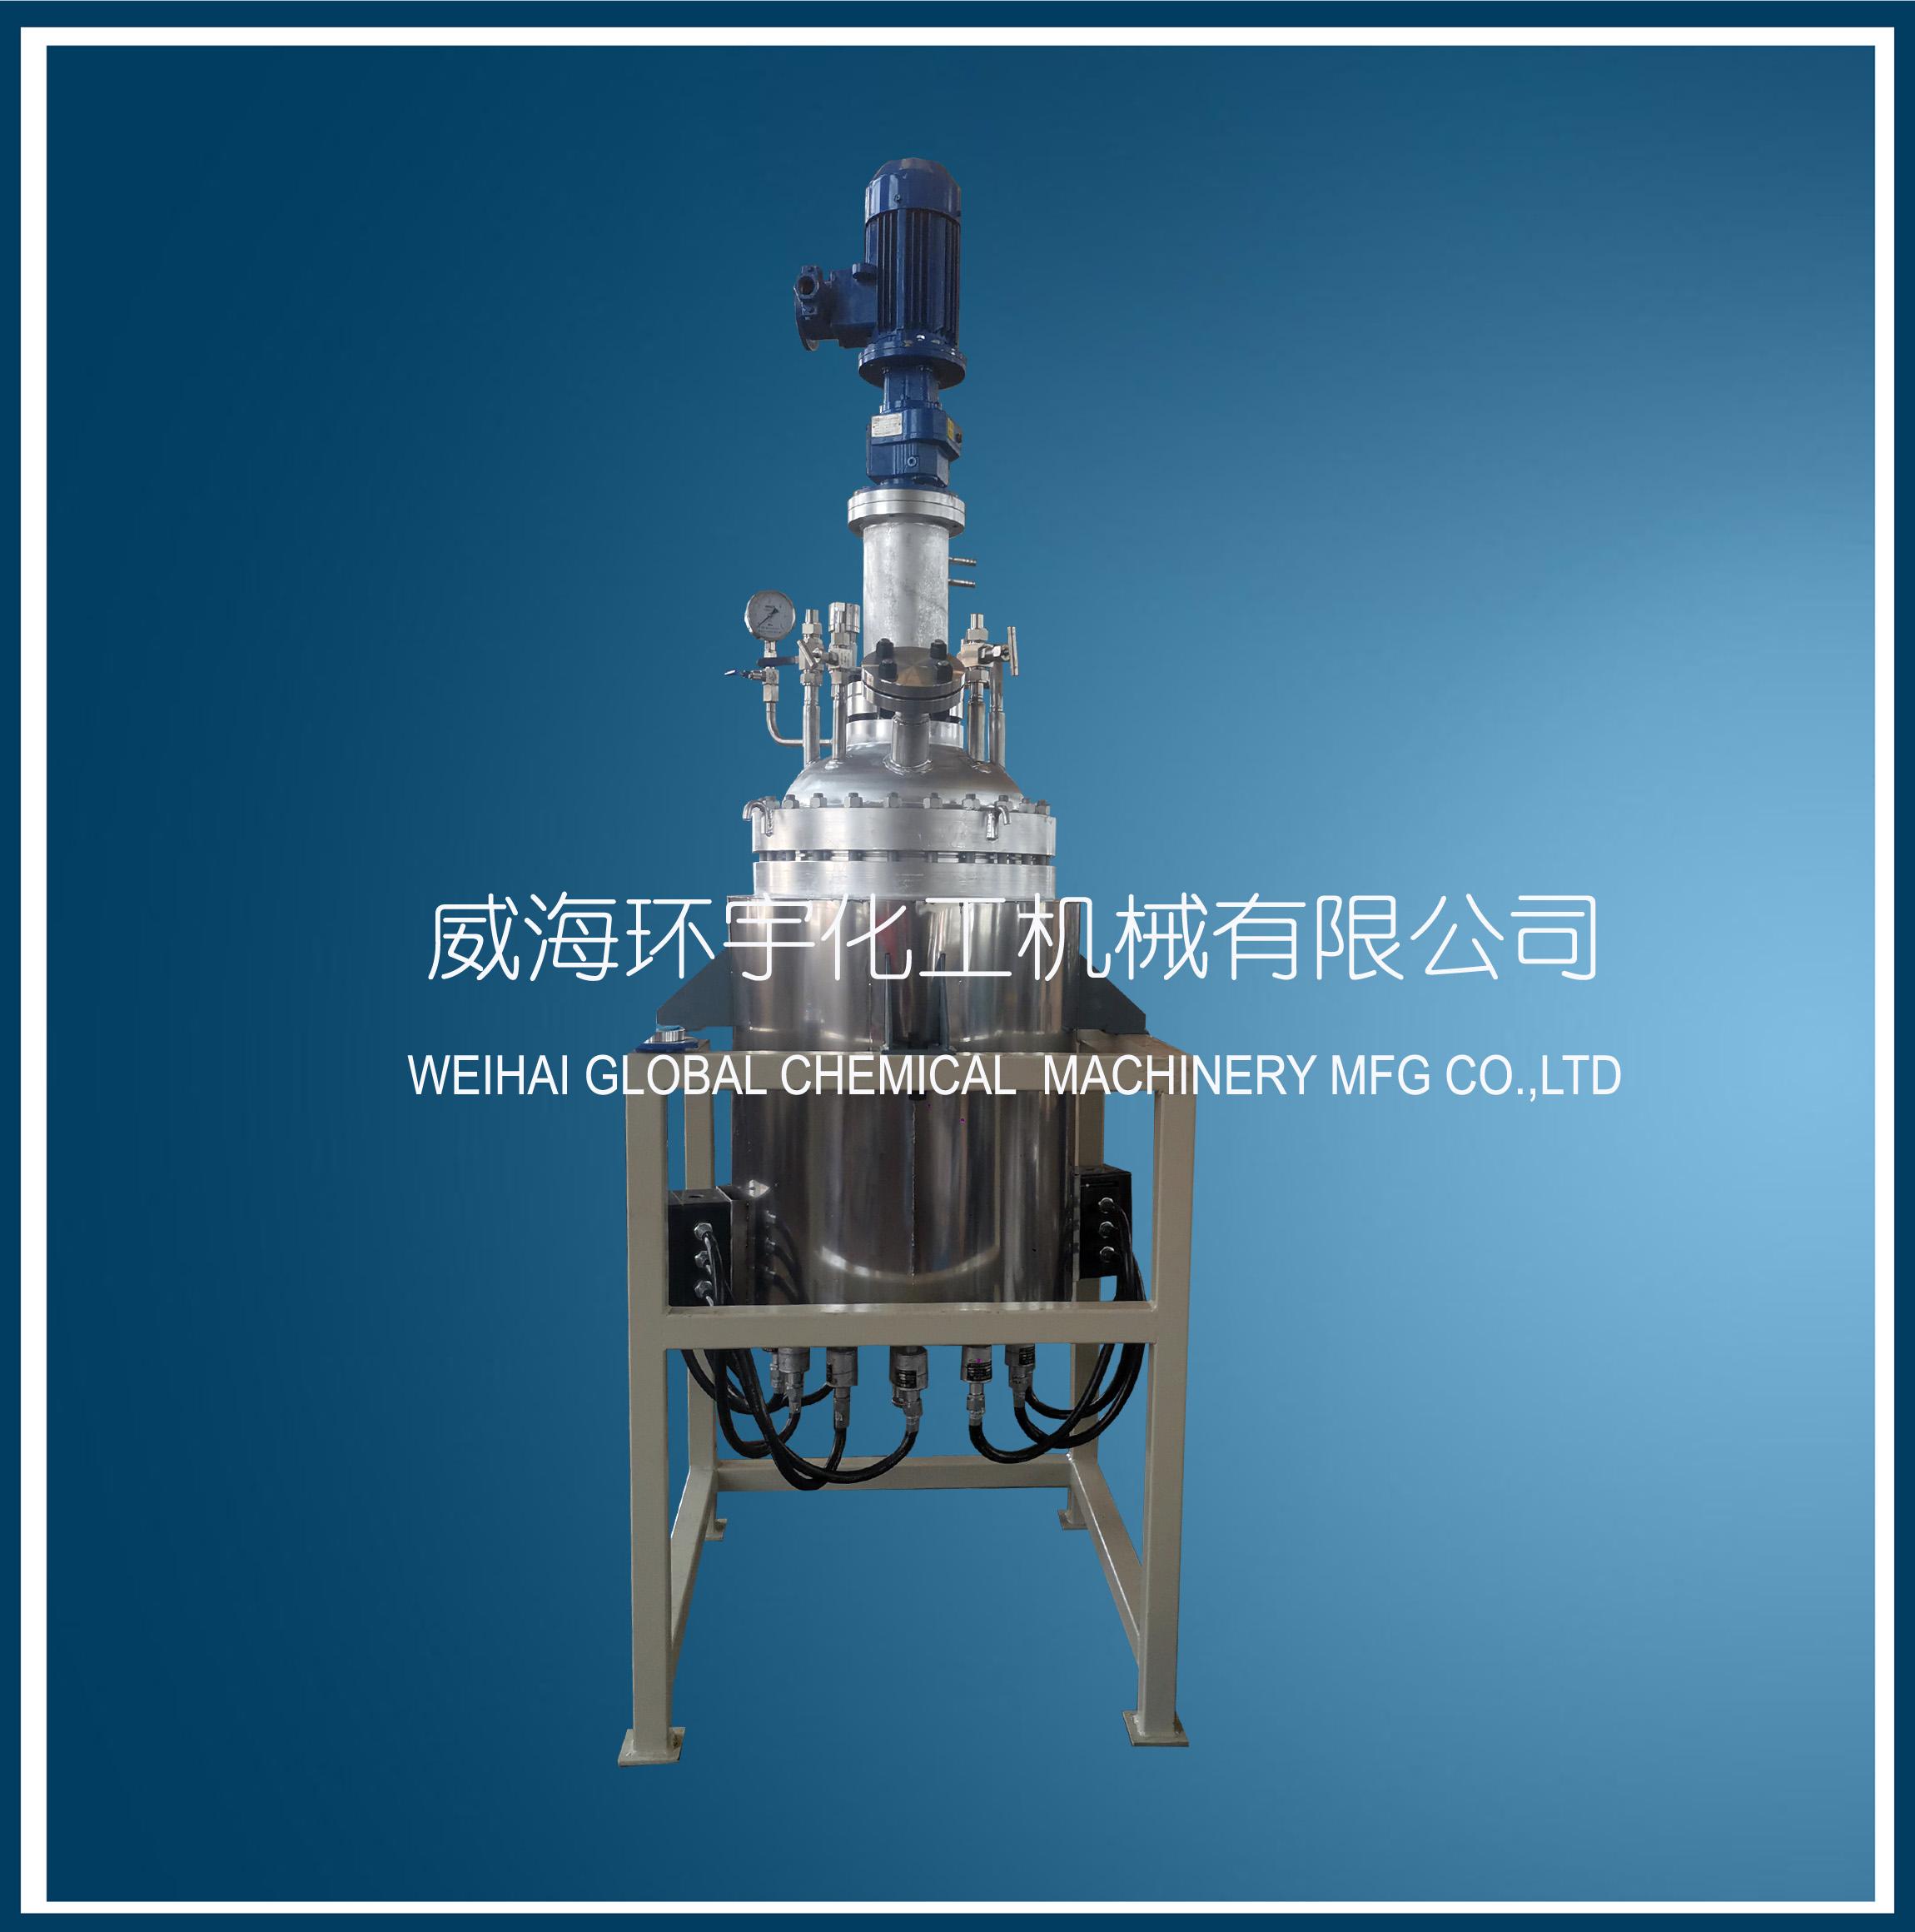 100L加氢反应釜已完工发往葫芦岛